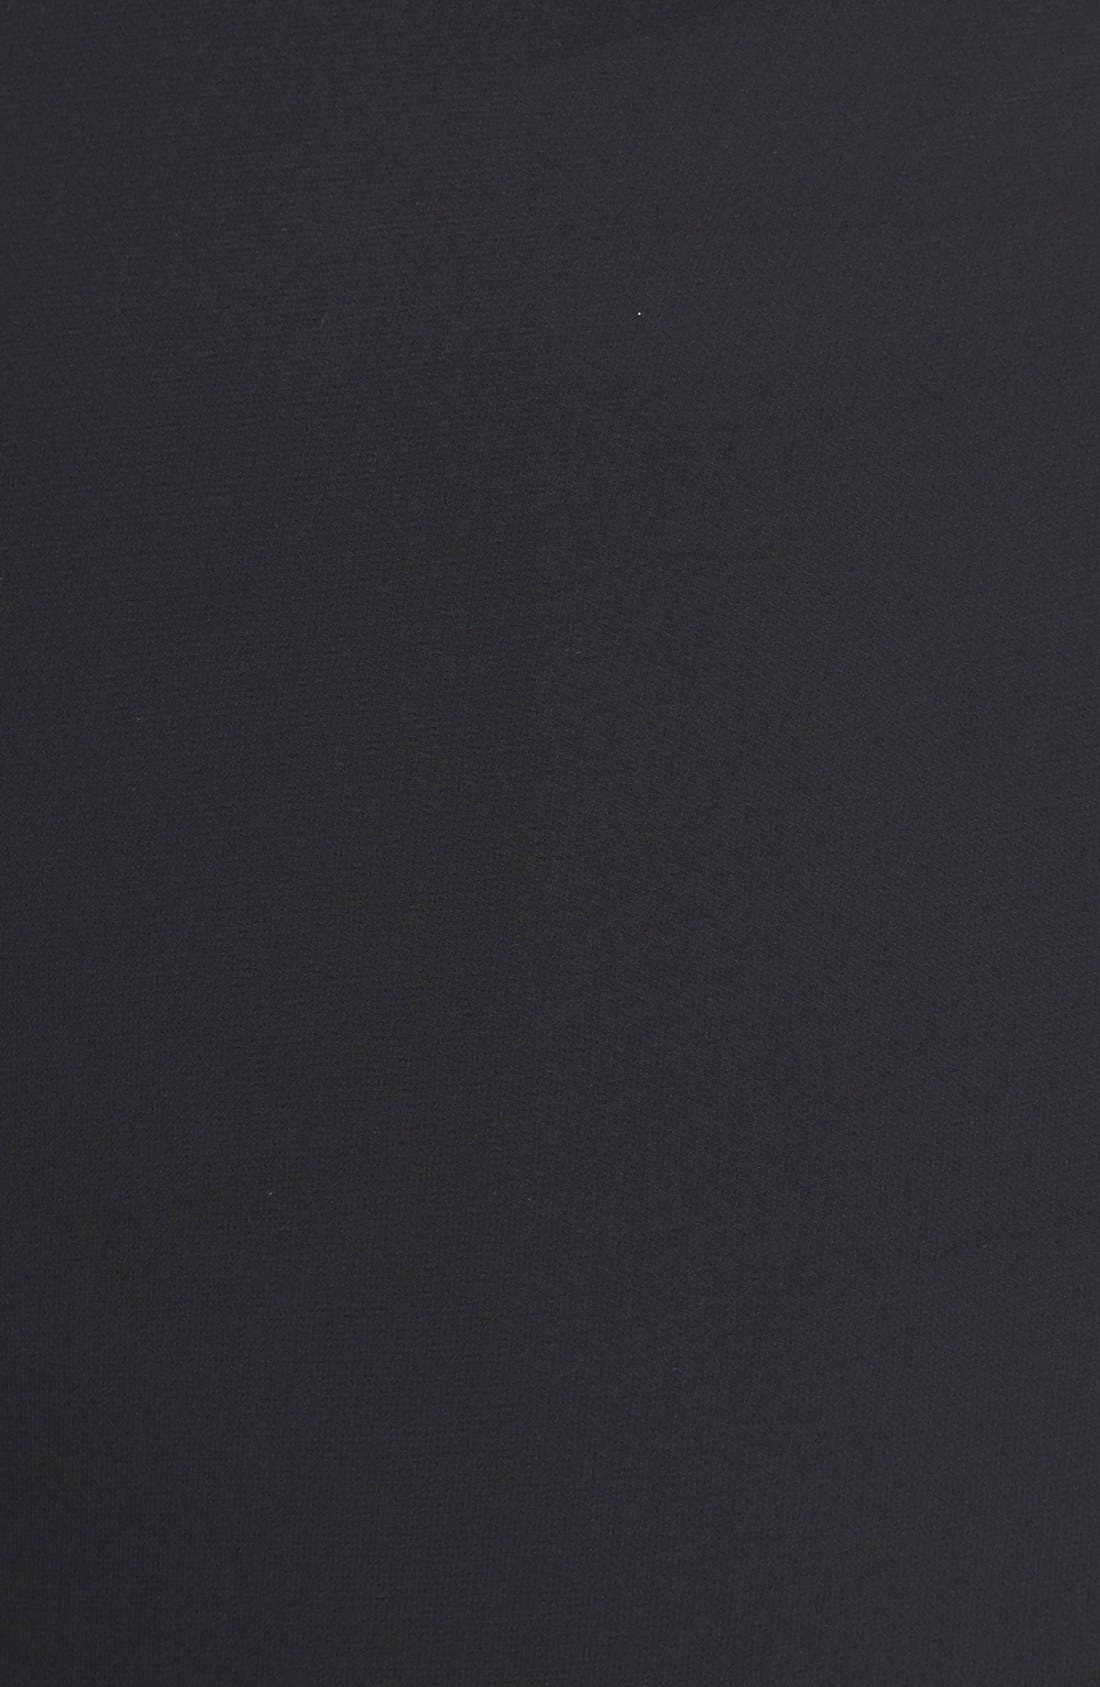 Alternate Image 3  - Vince Camuto Chiffon Overlay Maxi Dress (Plus Size)